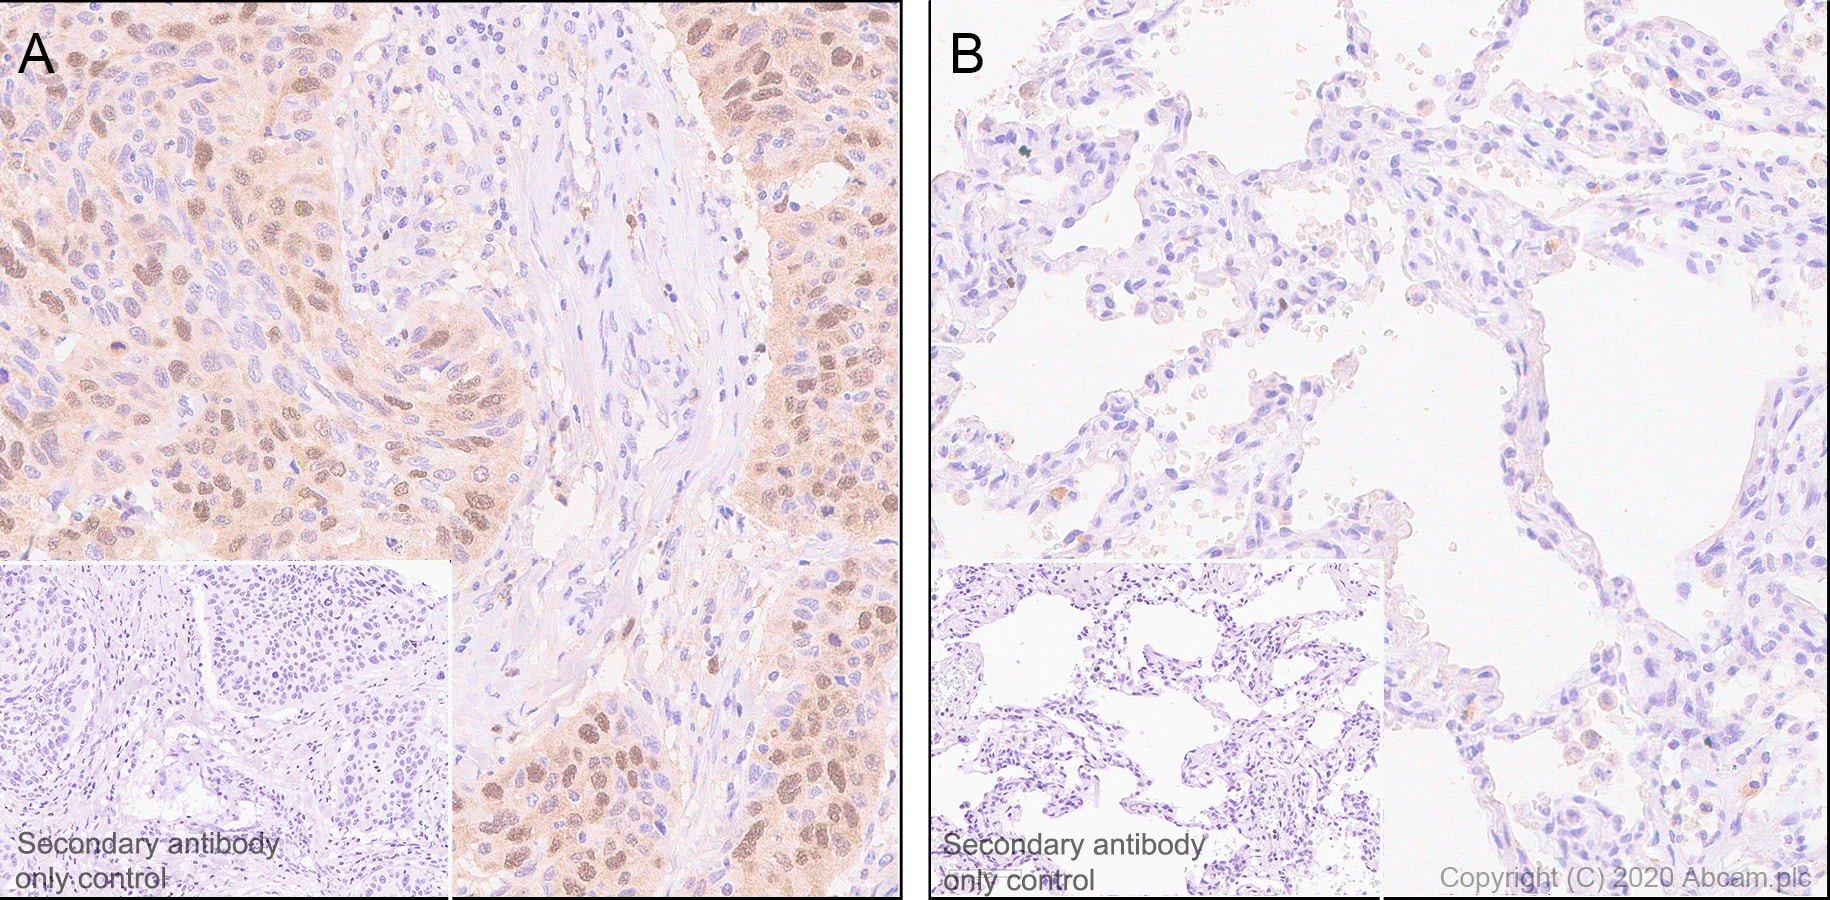 Immunohistochemistry (Formalin/PFA-fixed paraffin-embedded sections) - Anti-ZWINT antibody [EPR23440-96] (ab252950)